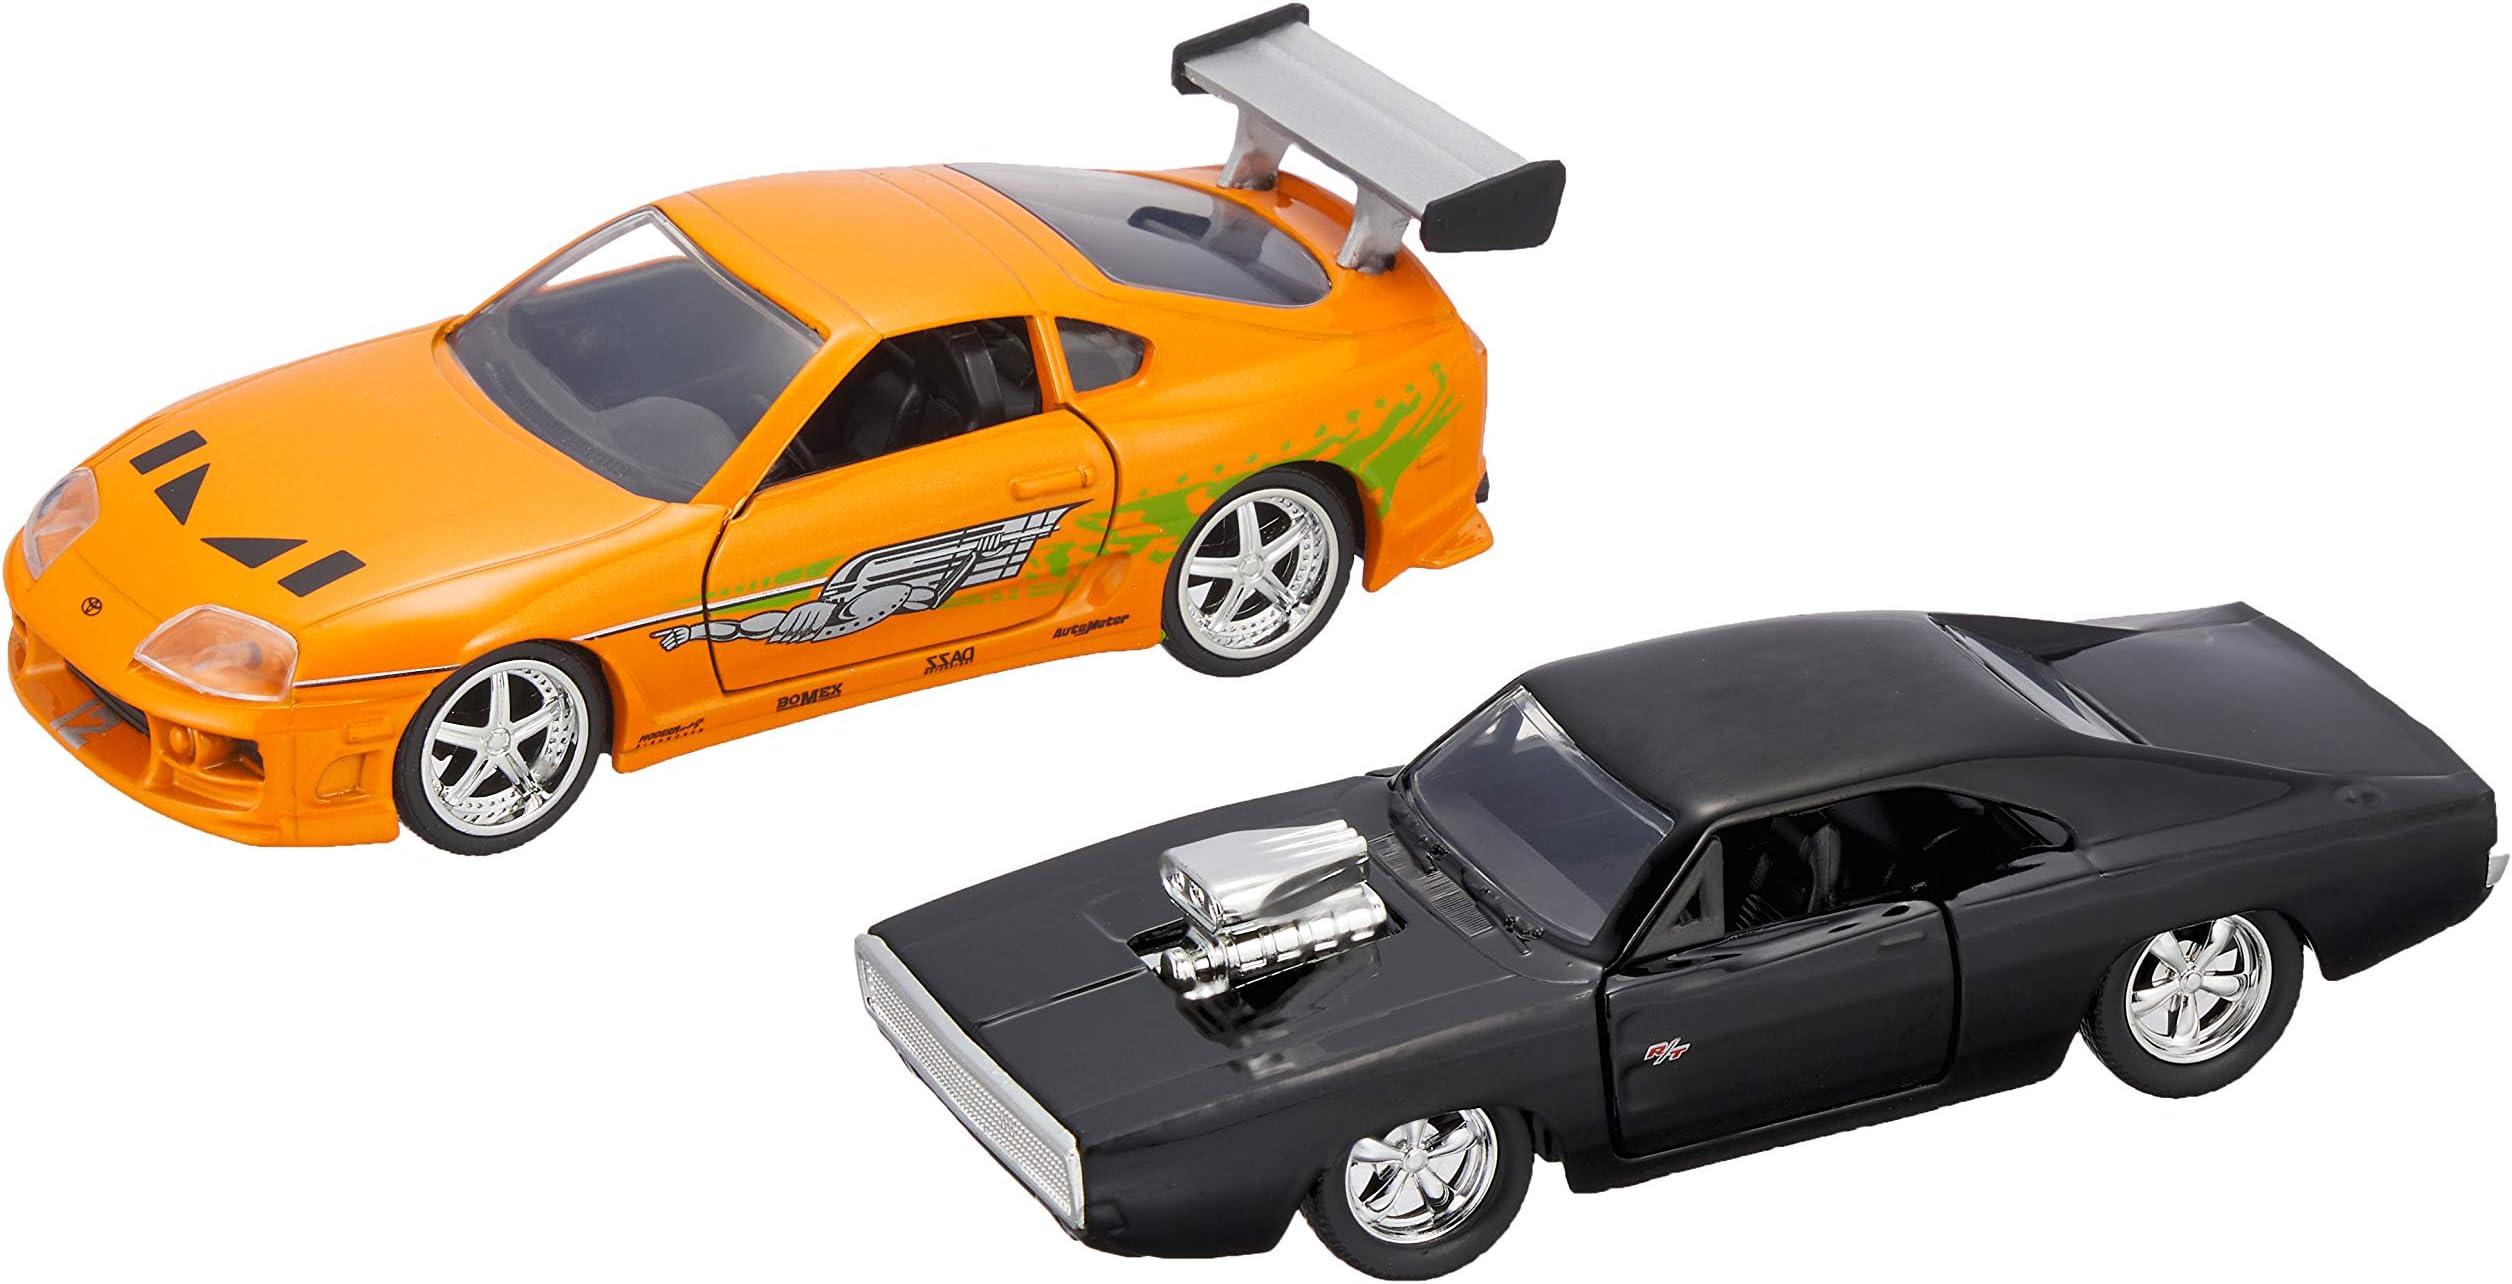 Jada 1995 Supra Furious 7 Car Toy 1//32 scale Diecast White Vehicle Model